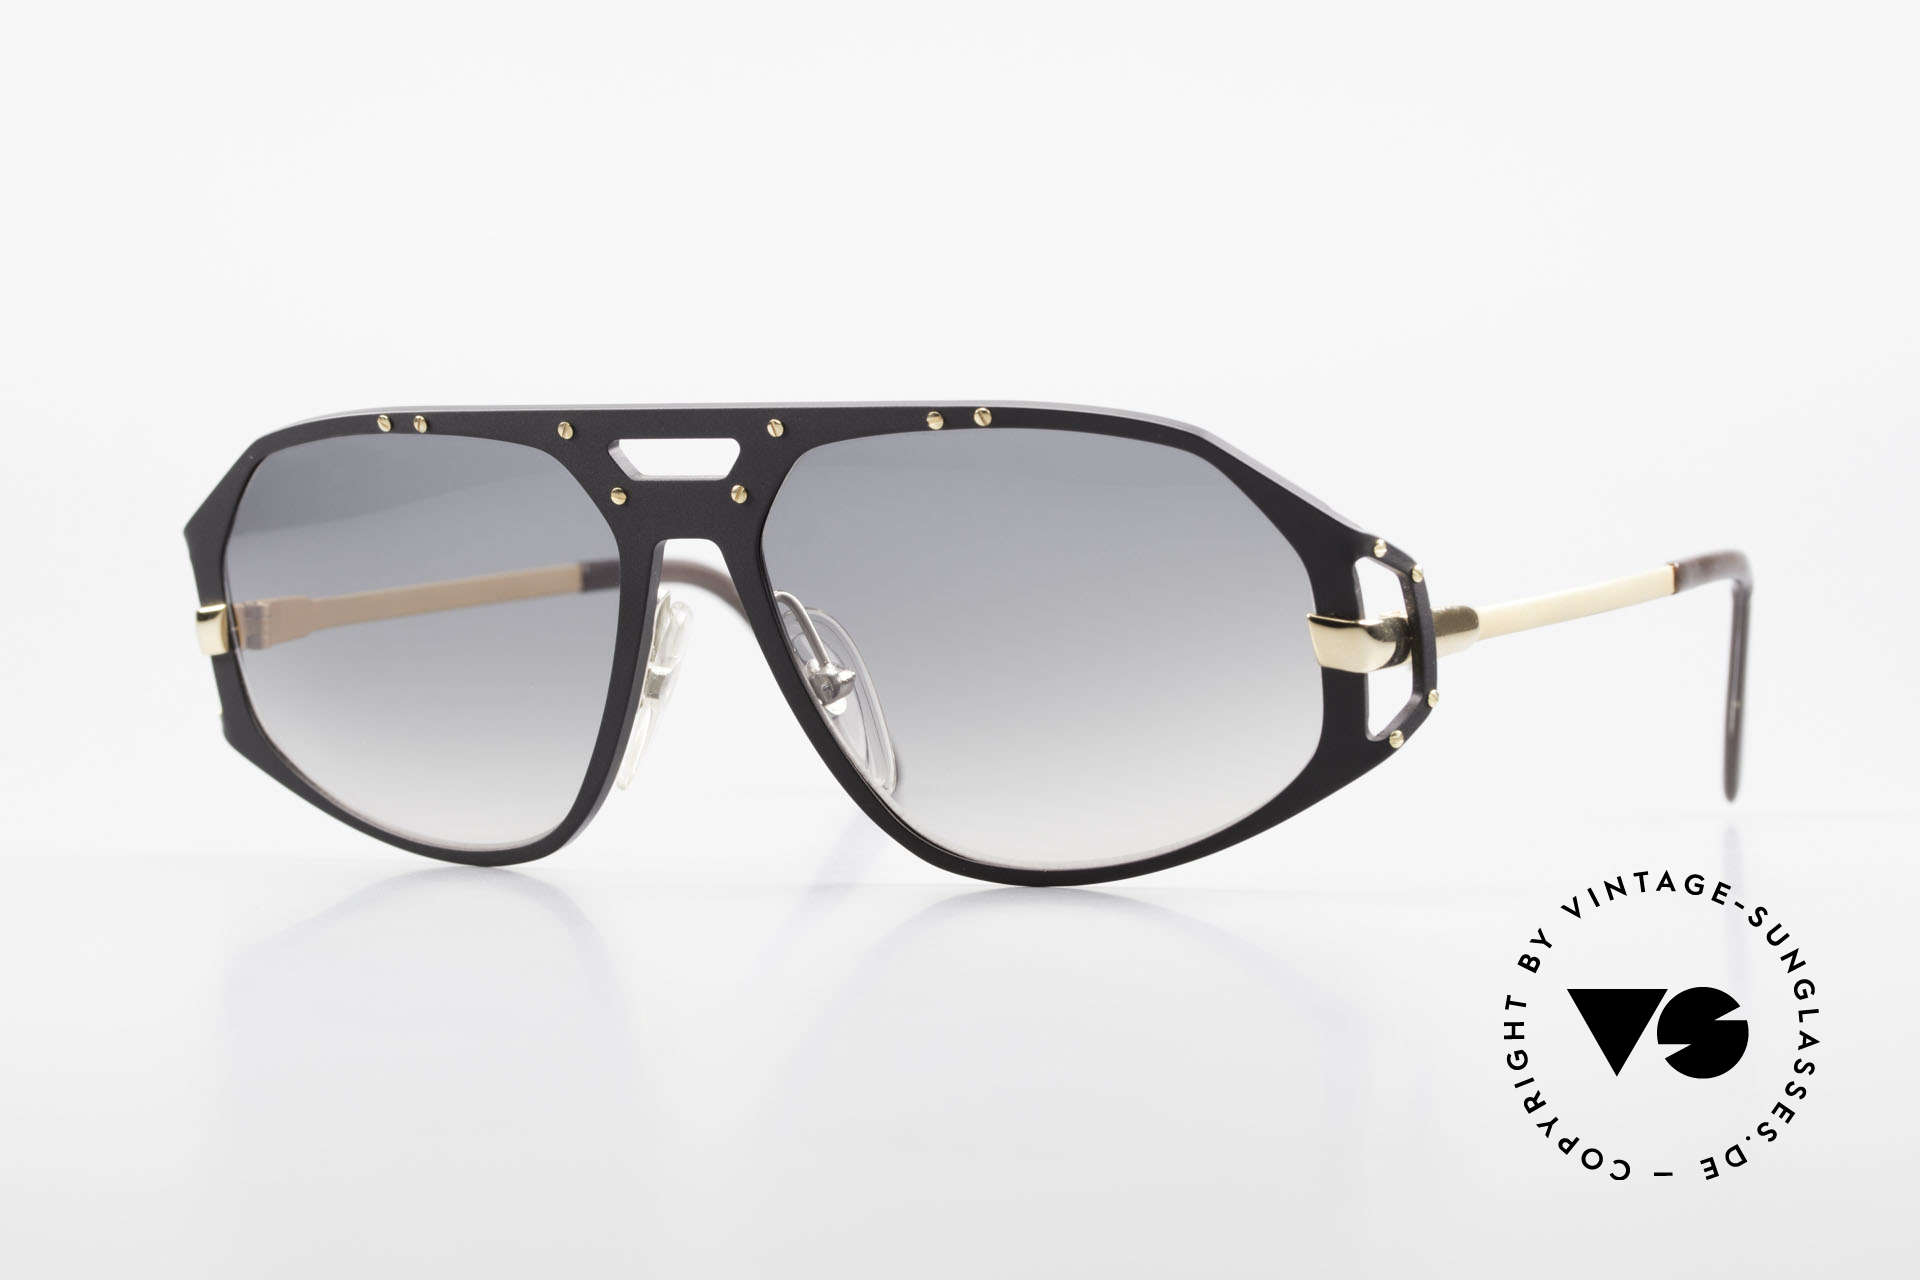 Alpina A50 Ultra Rare 1990's Sunglasses, Alpina Model A50 = ultra rare vintage sunglasses, Made for Men